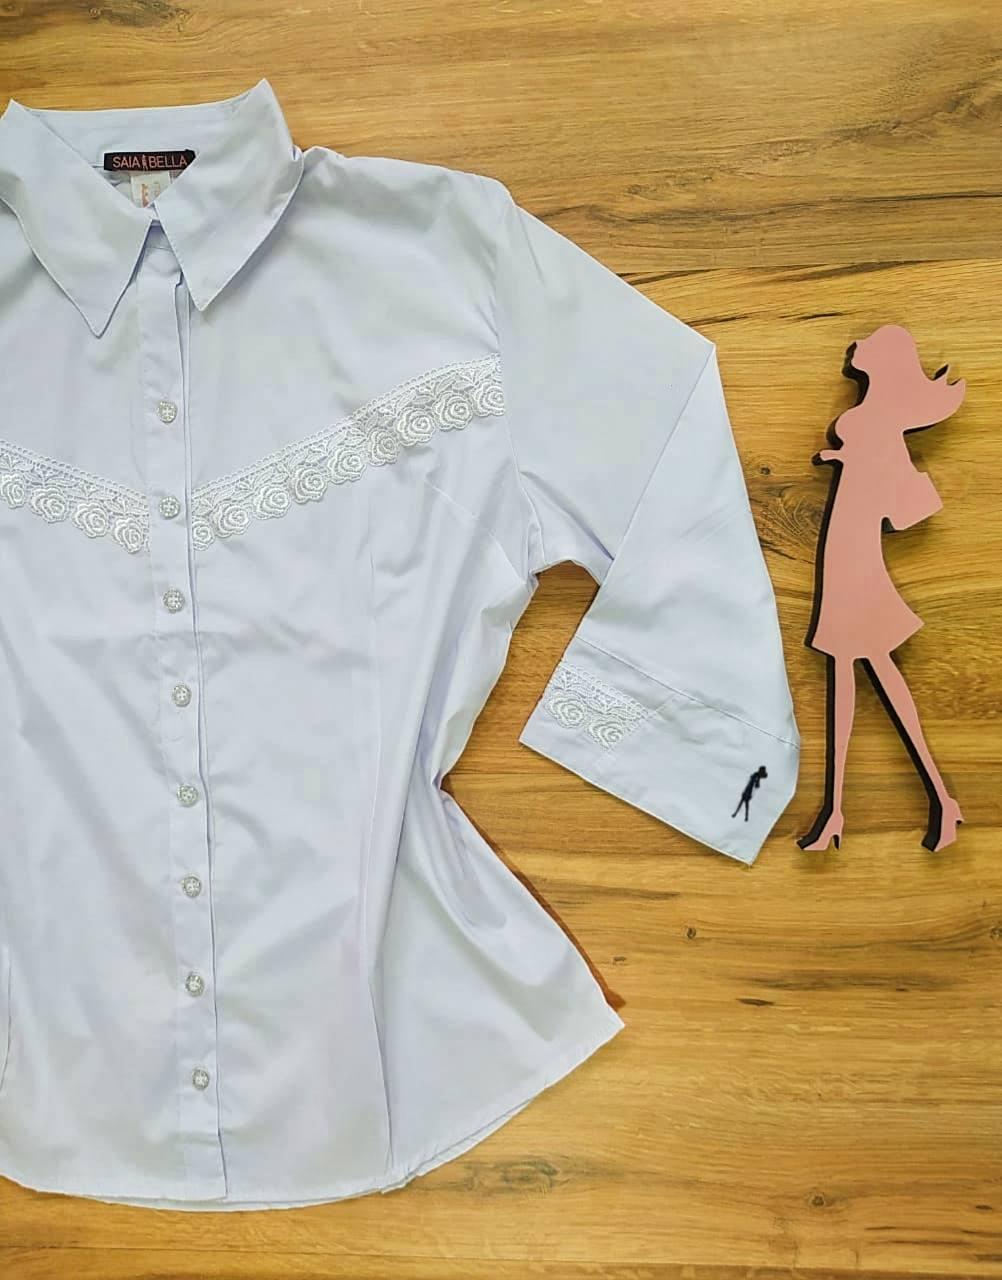 Camisa Daiany Manga 3/4 Saia Bella SB33185 Branco